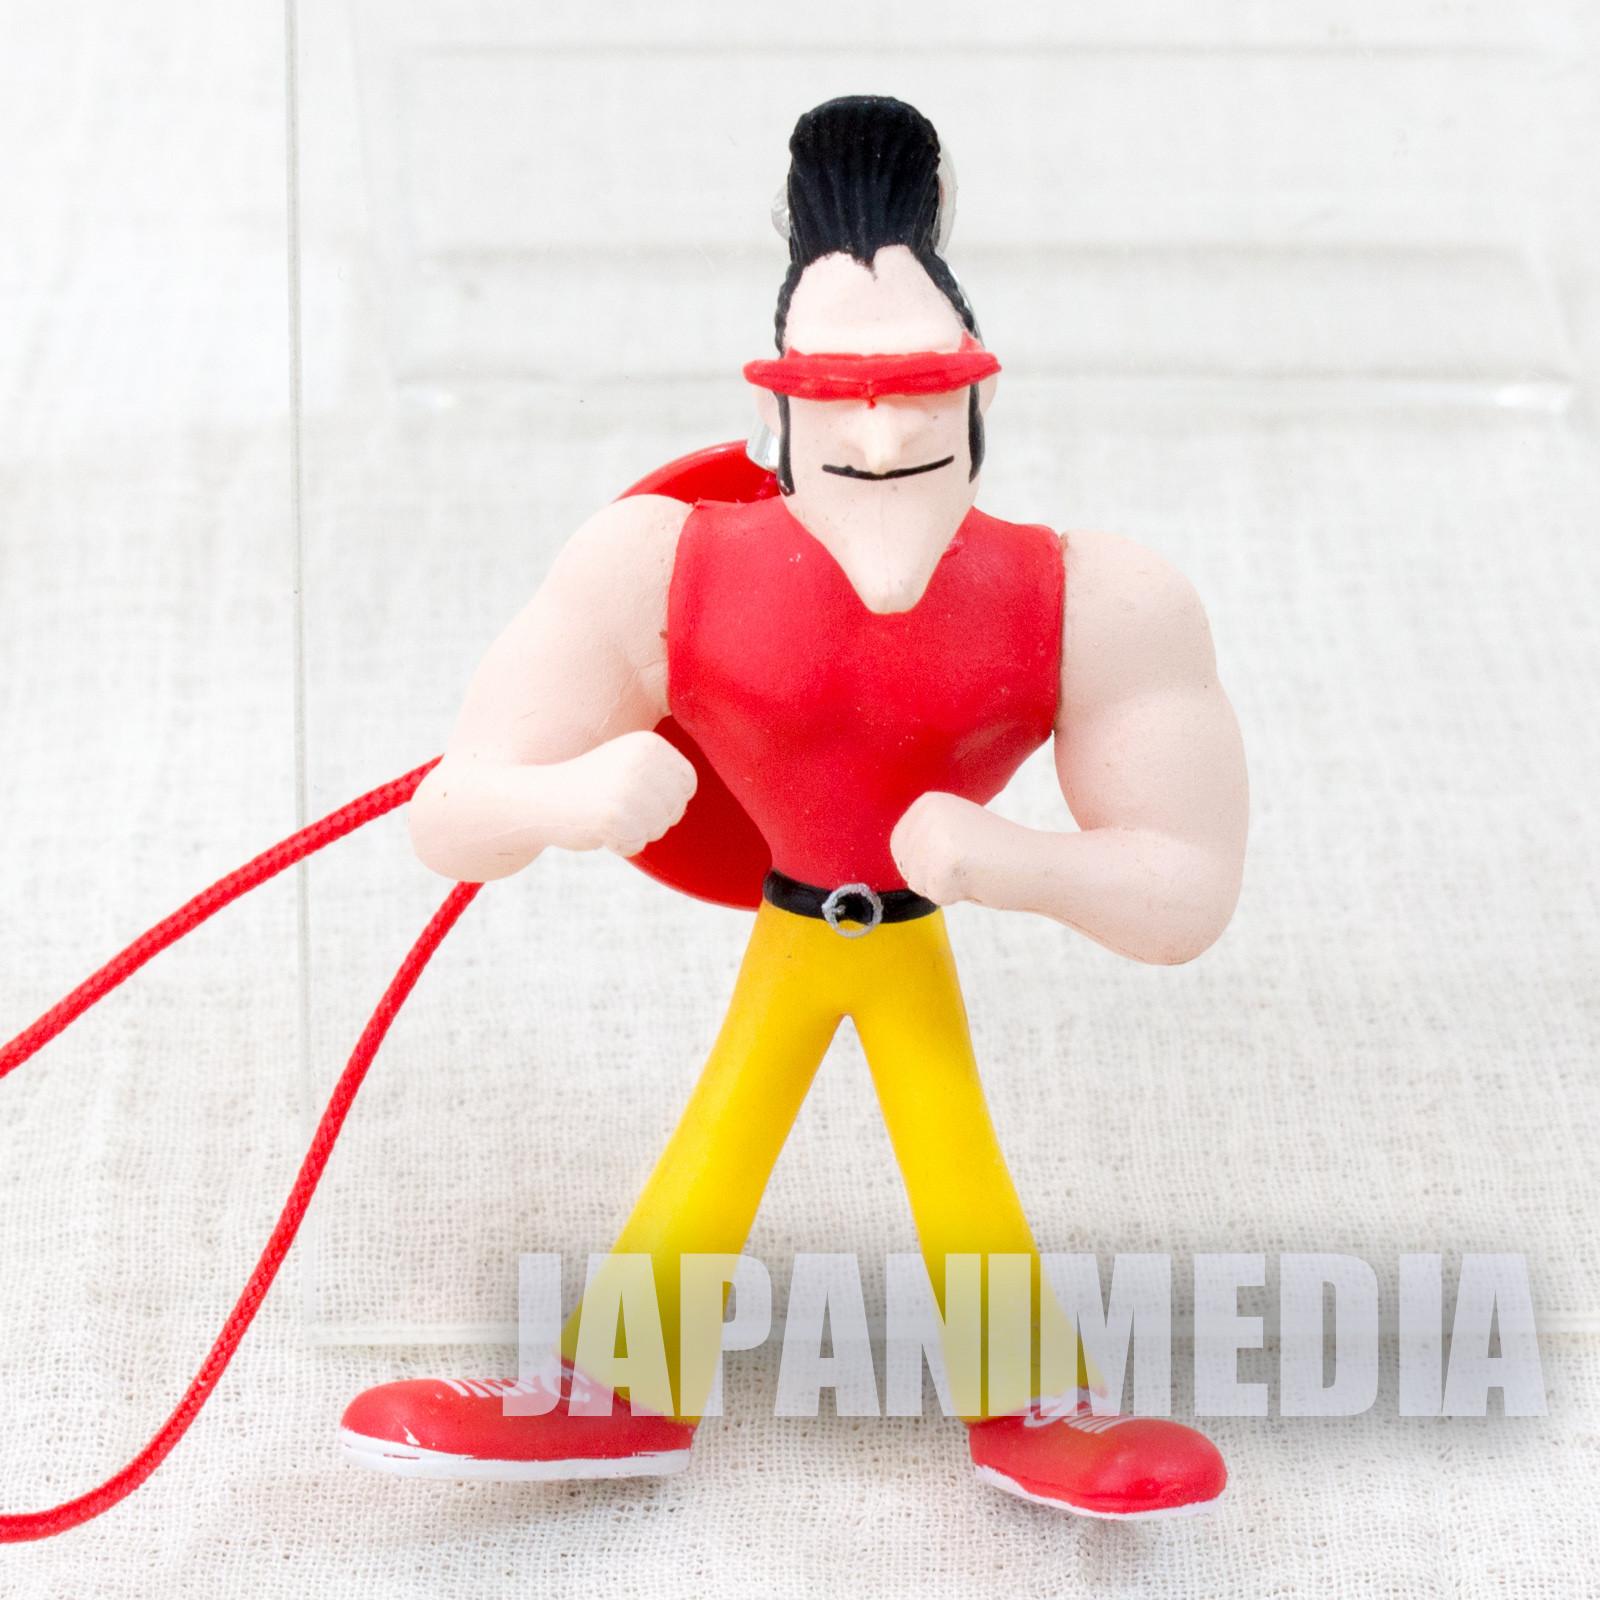 Mother Teddy Figure Strap Nintendo Takara Tomy JAPAN GAME NES FAMICOM